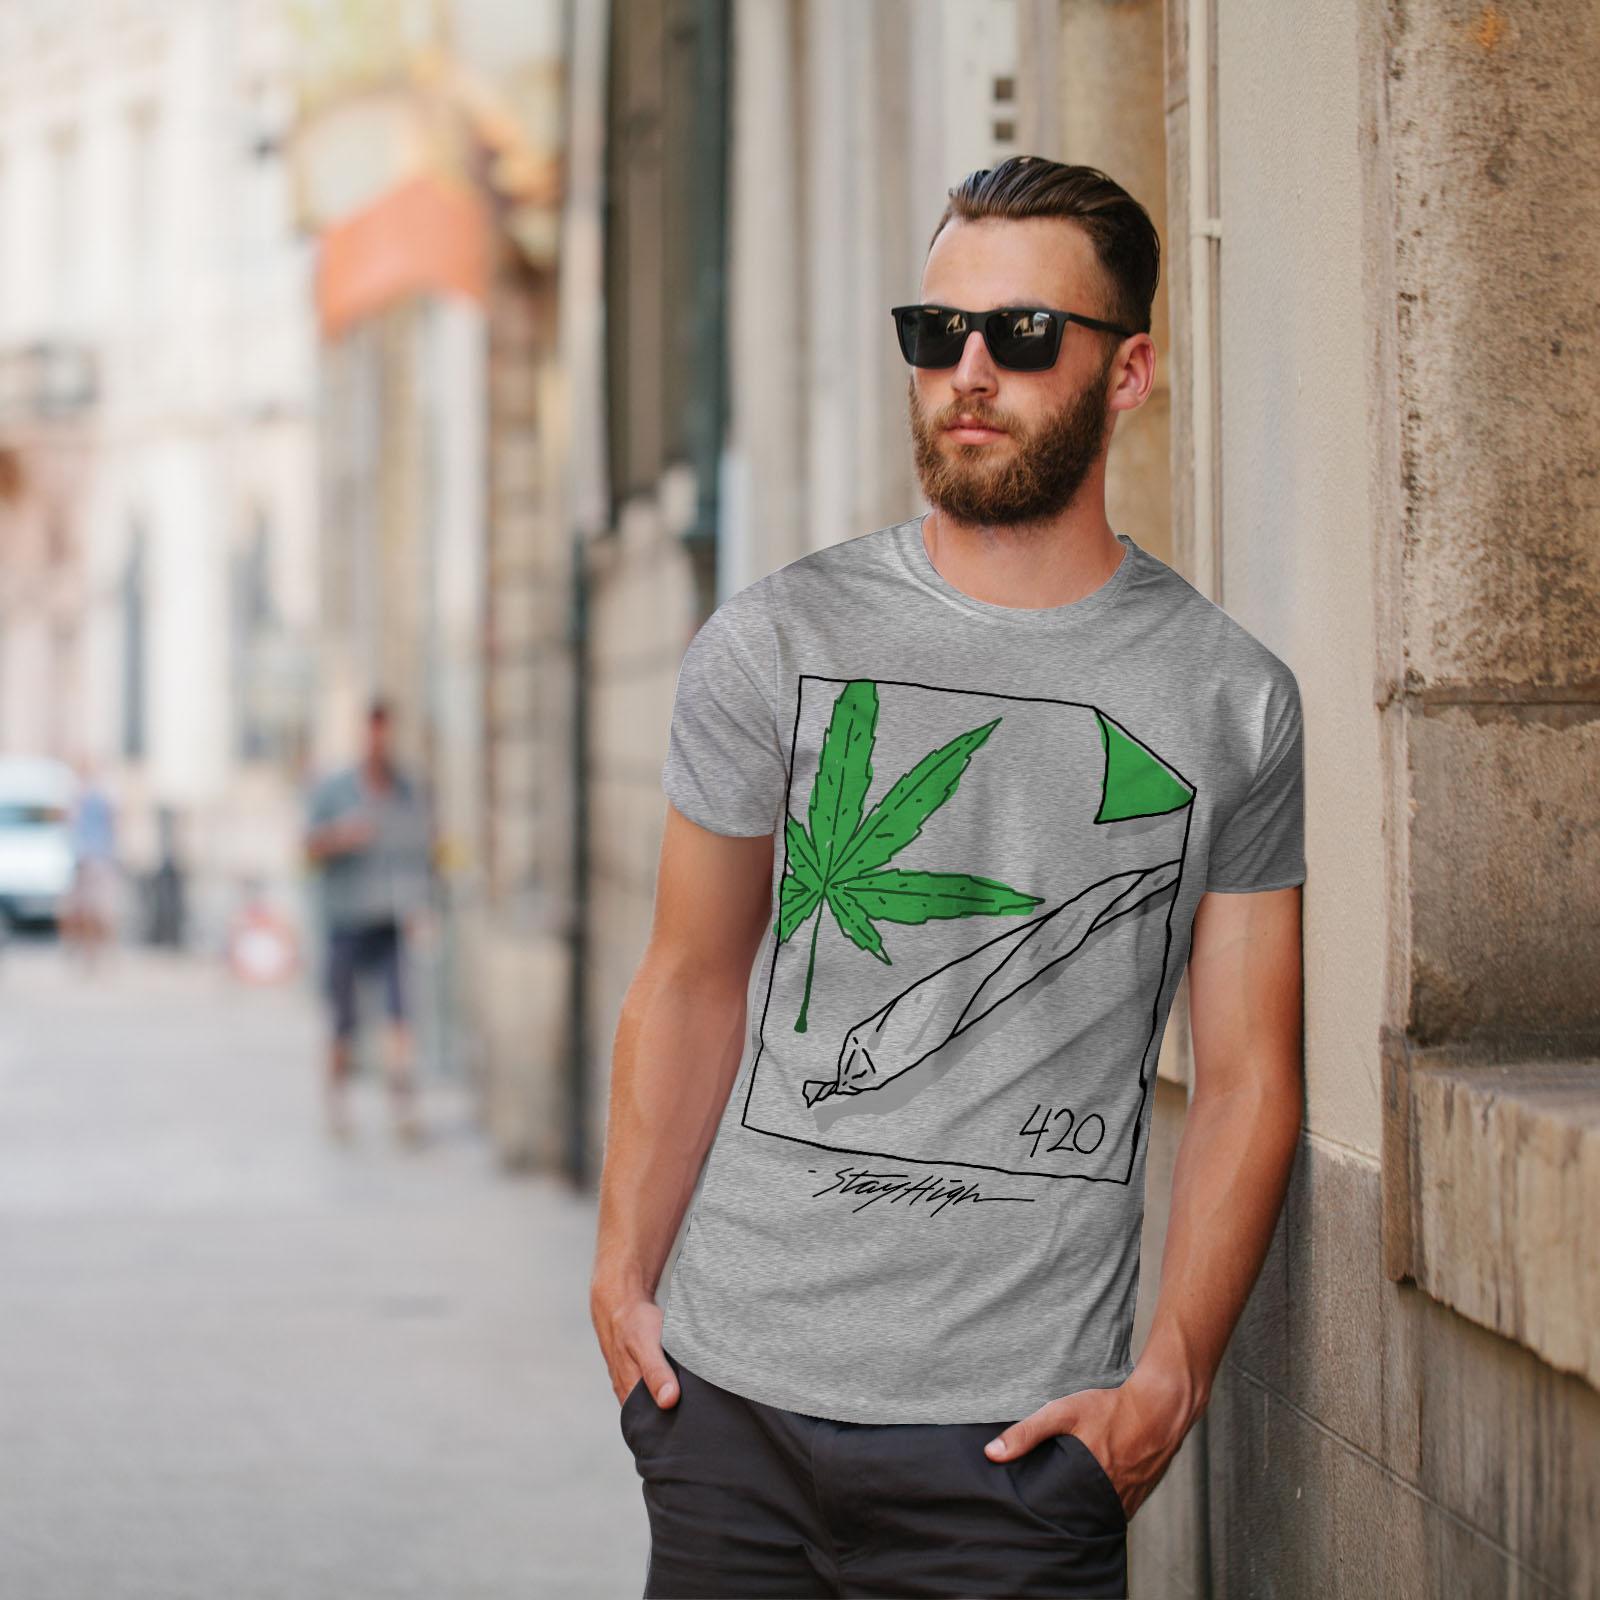 Rast Weed Graphic Design Printed Tee Wellcoda 42 Ganja Joint Mens T-shirt